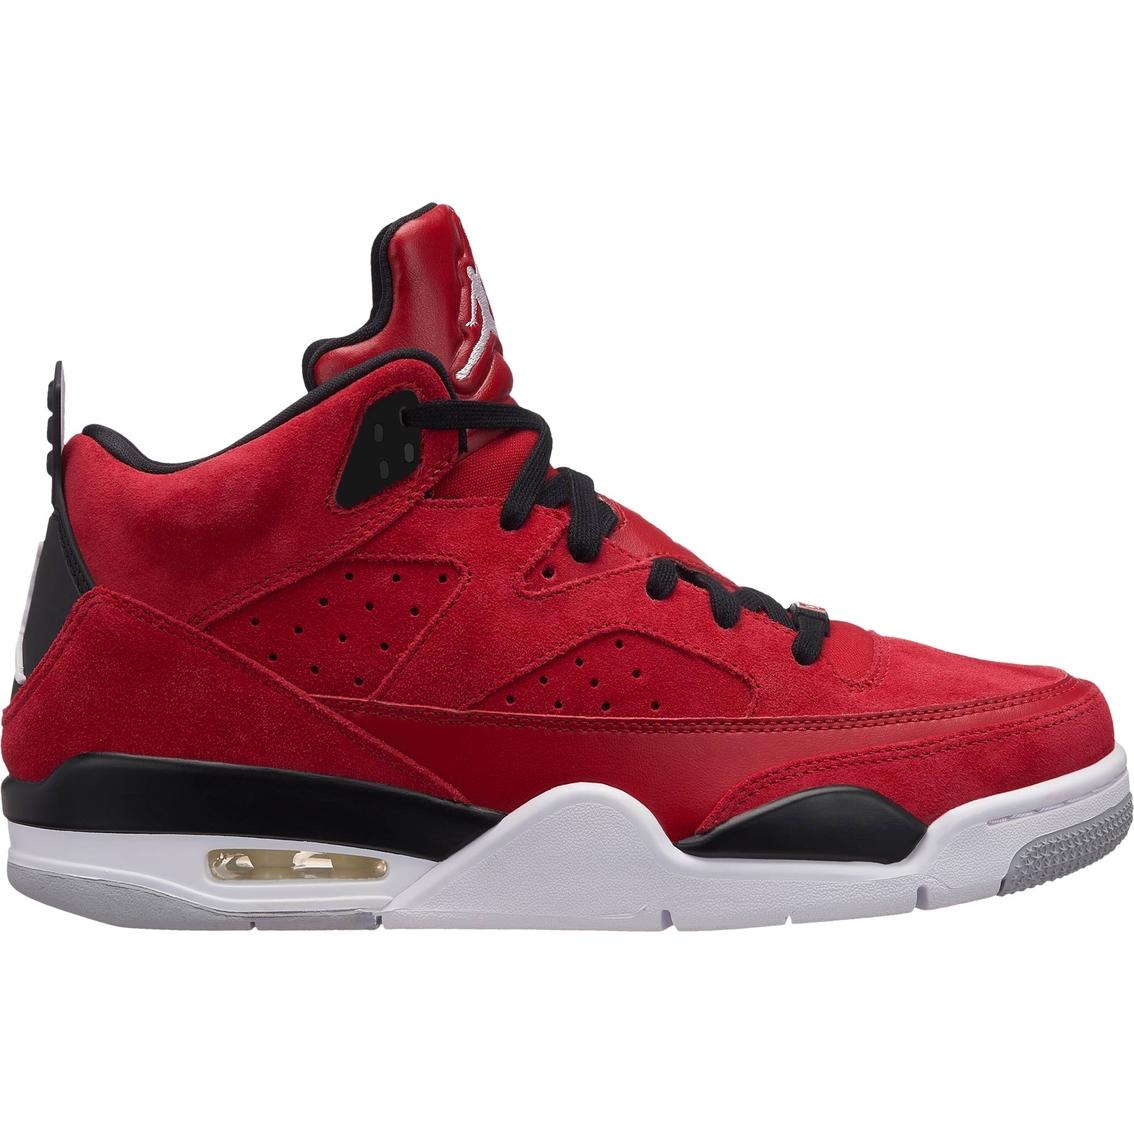 d9f1632c36a Jordan Men's Son Of Mars Low Basketball Shoes | Basketball ...